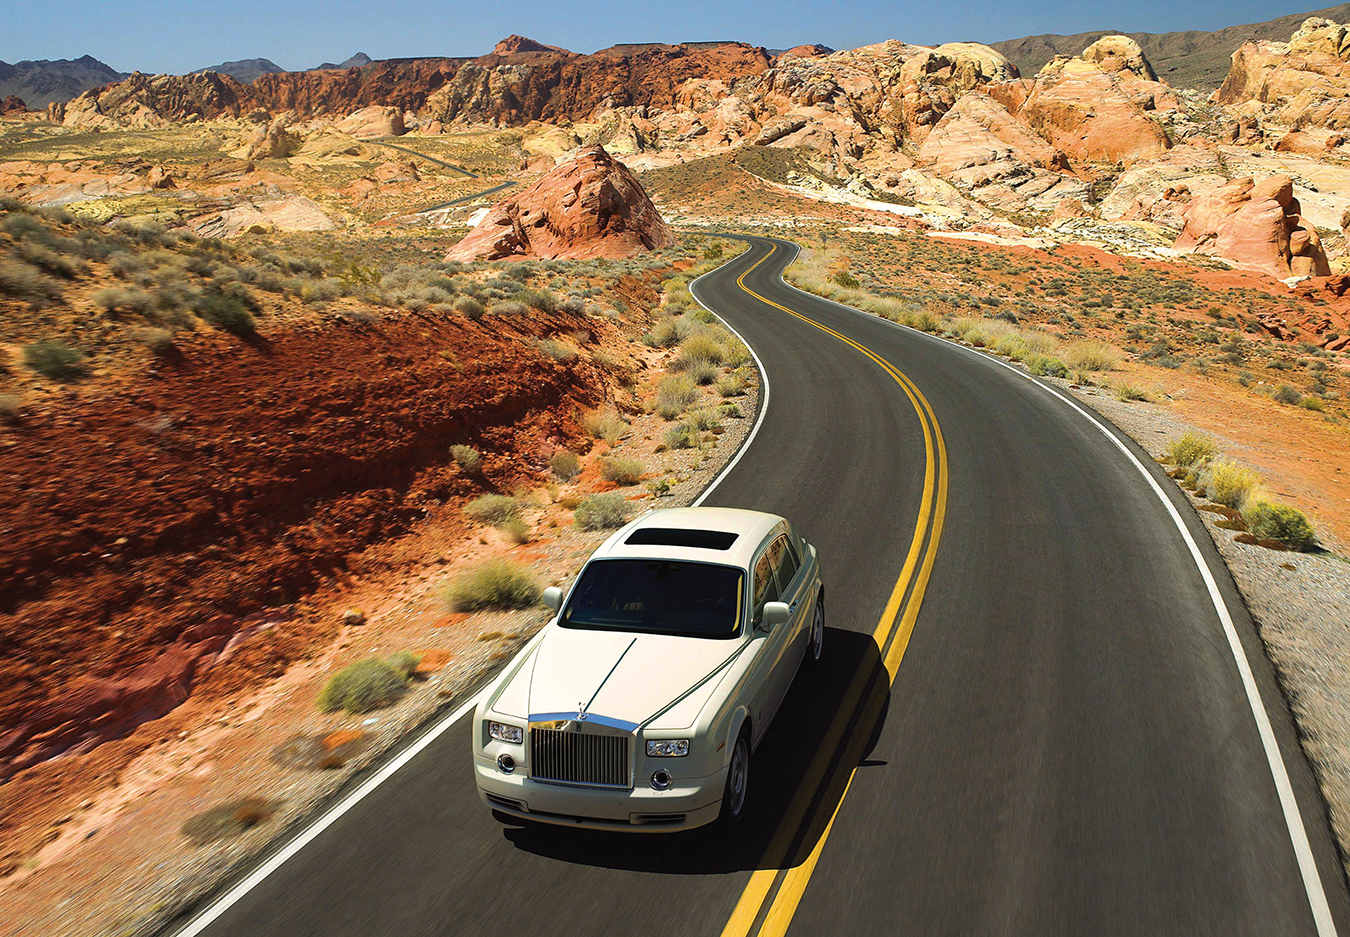 NUVO Magazine: The Rolls-Royce Phantom